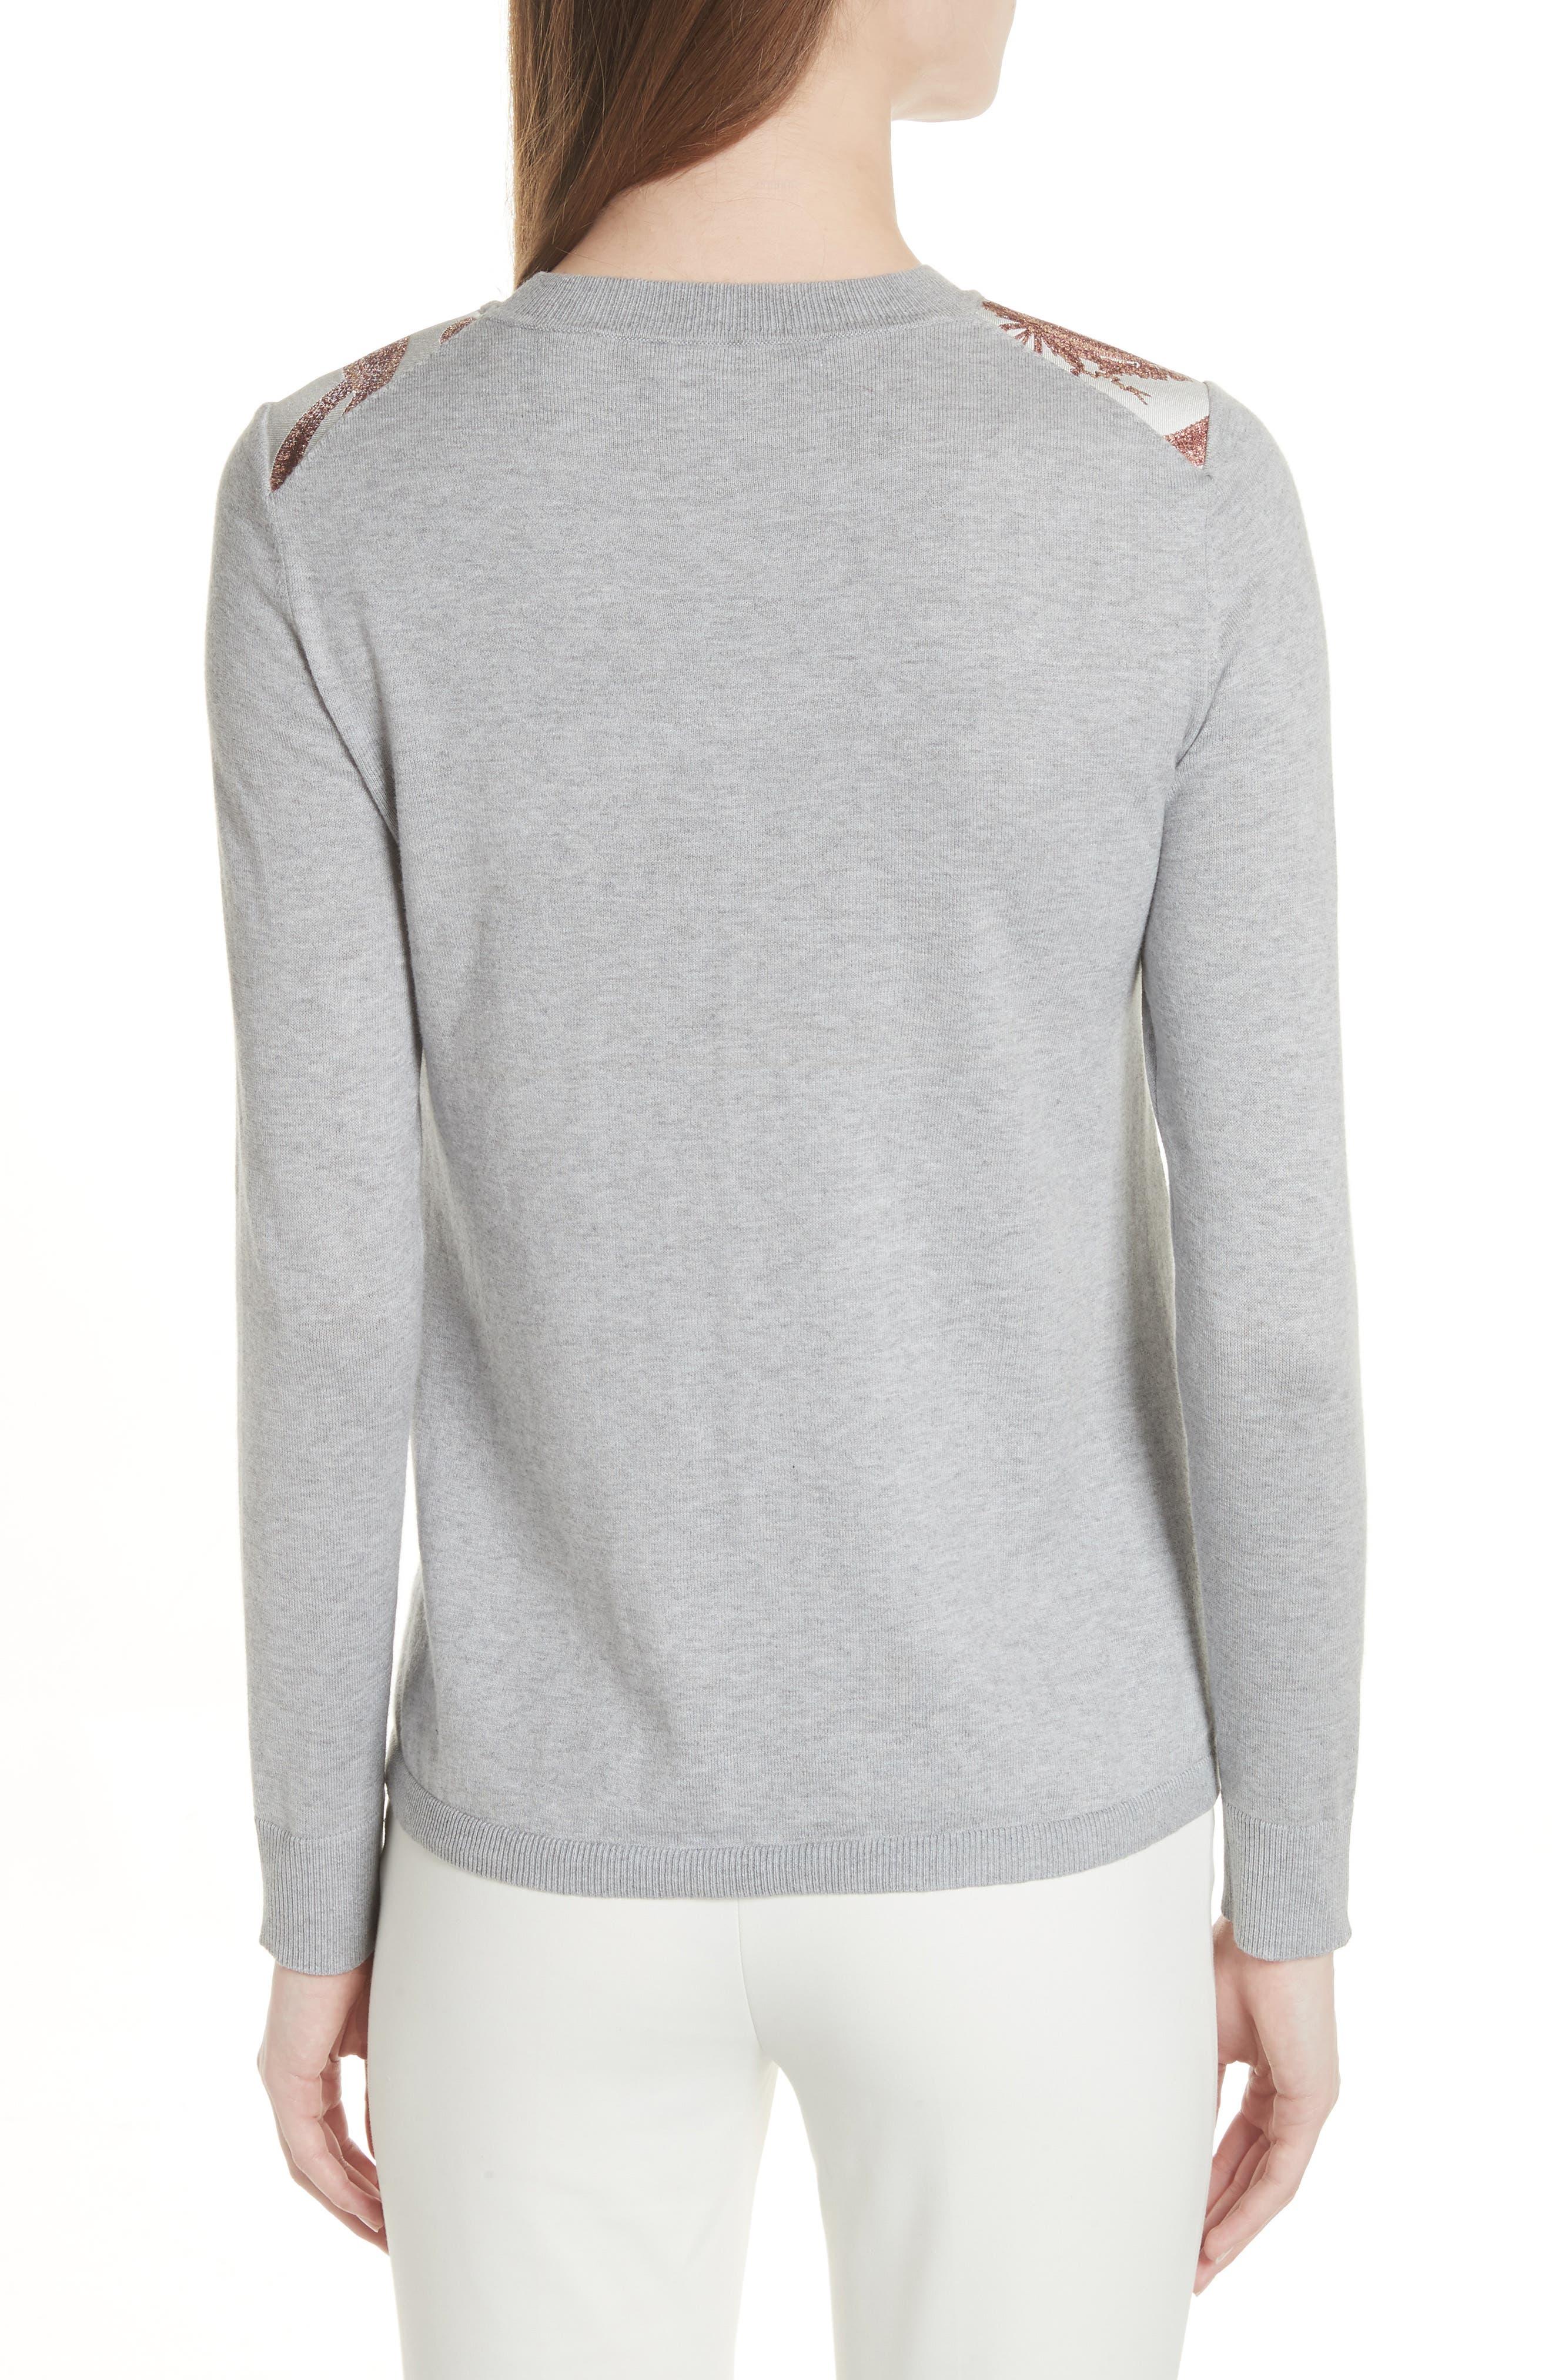 Versailles Jacquard Front Sweater,                             Alternate thumbnail 2, color,                             050